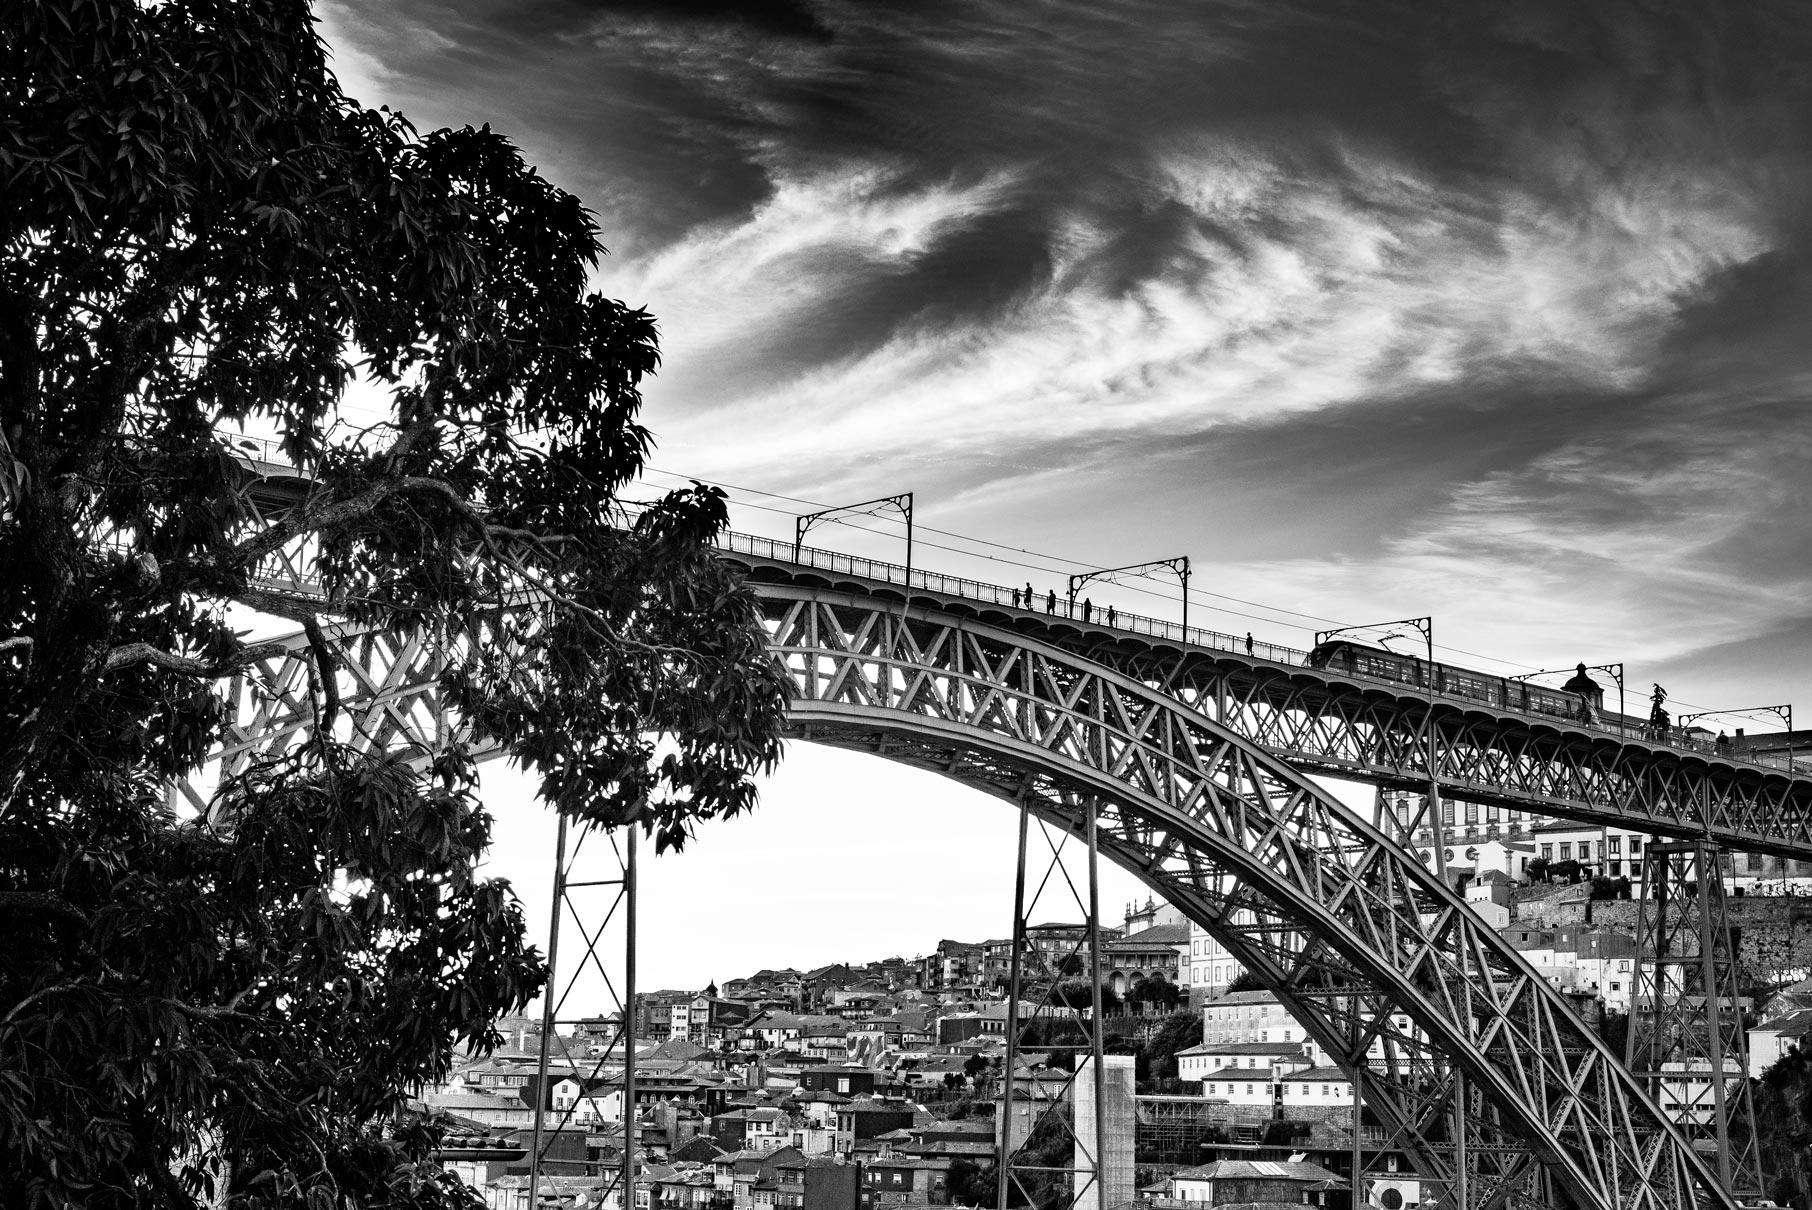 Paesaggi-Portogallo - DSC 2545 - Ponte Dom Luis, Porto - Ponte Dom Luis, Porto